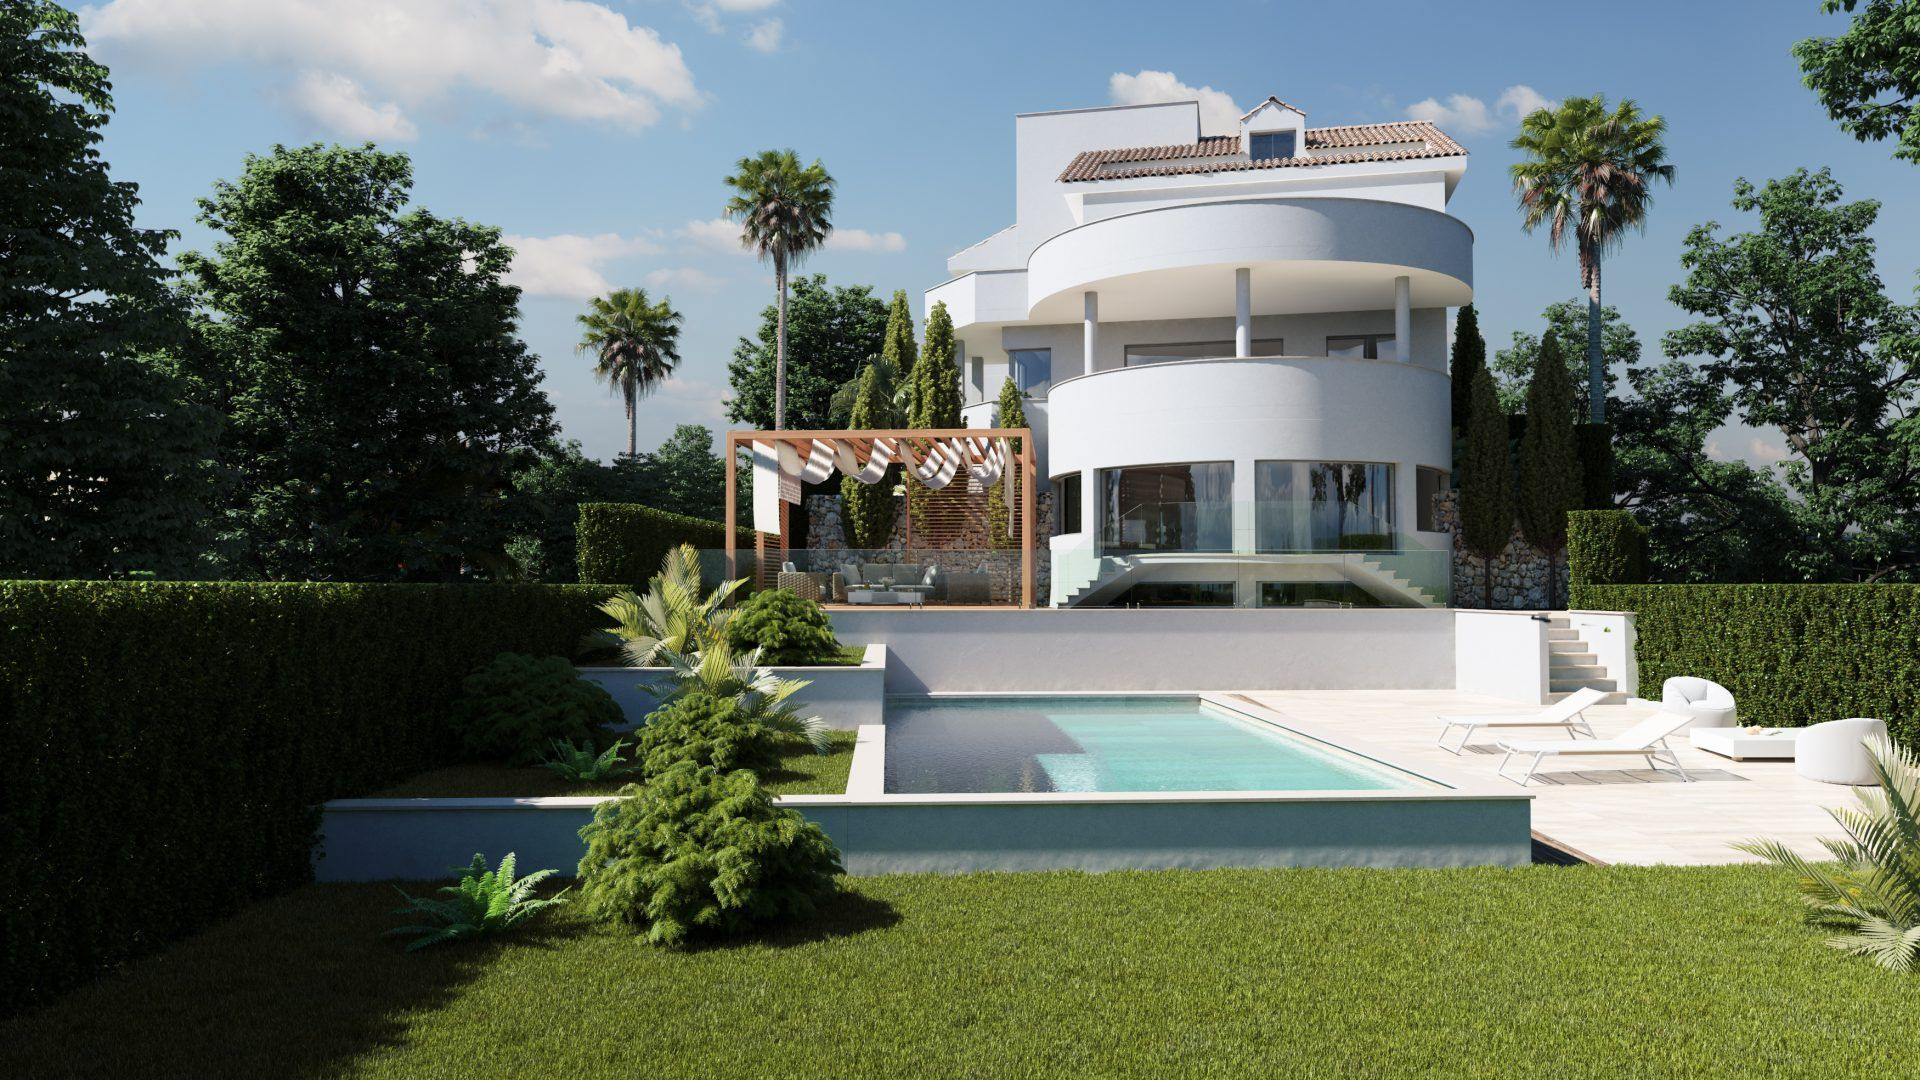 Infografías 3D para promoción inmobiliaria de dos villas en urbanización La Perla en Benalmádena.